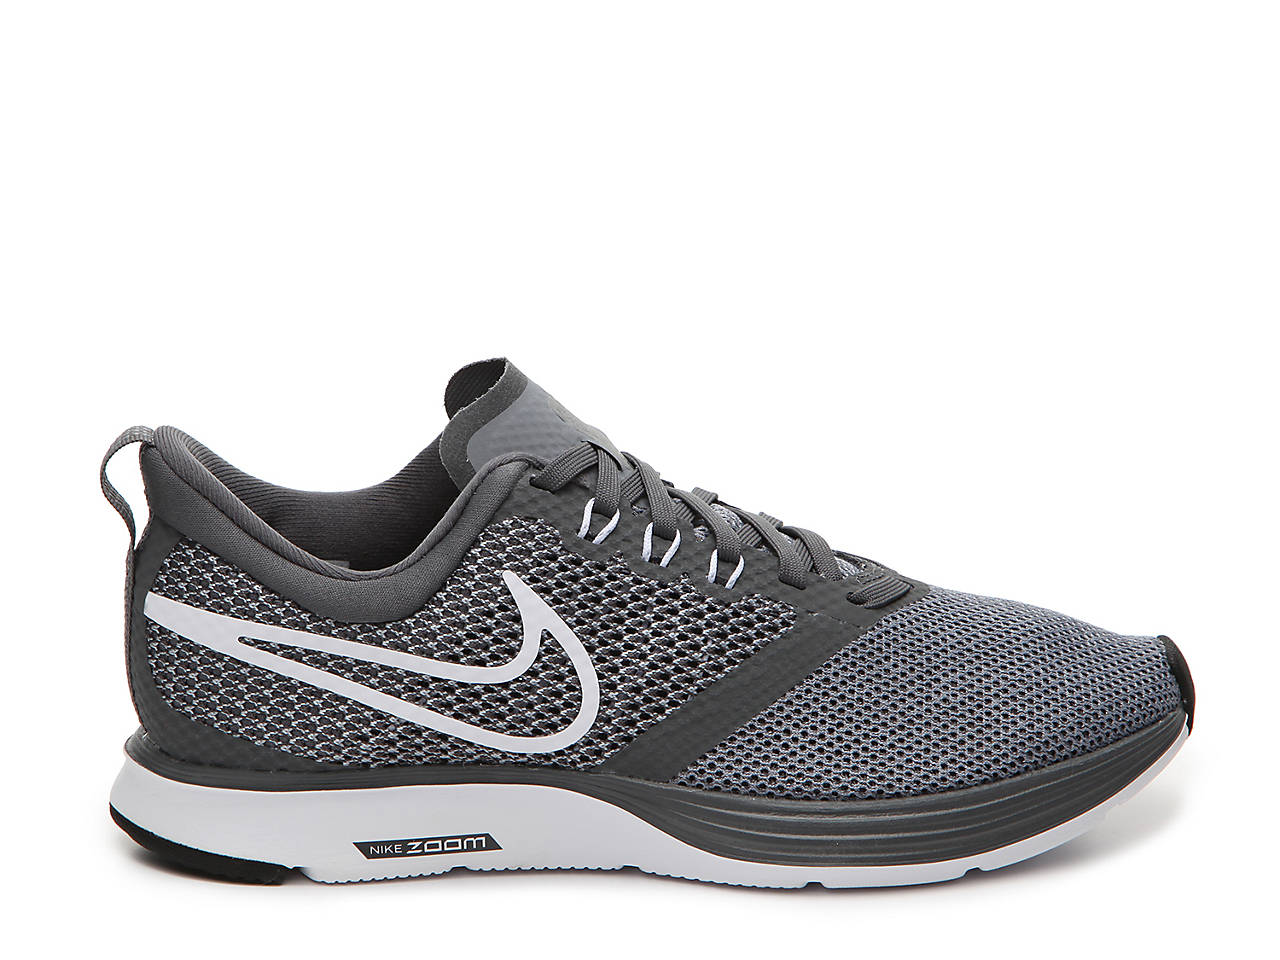 7d84ba2b9af2 Nike Zoom Strike Lightweight Running Shoe - Women s Women s Shoes